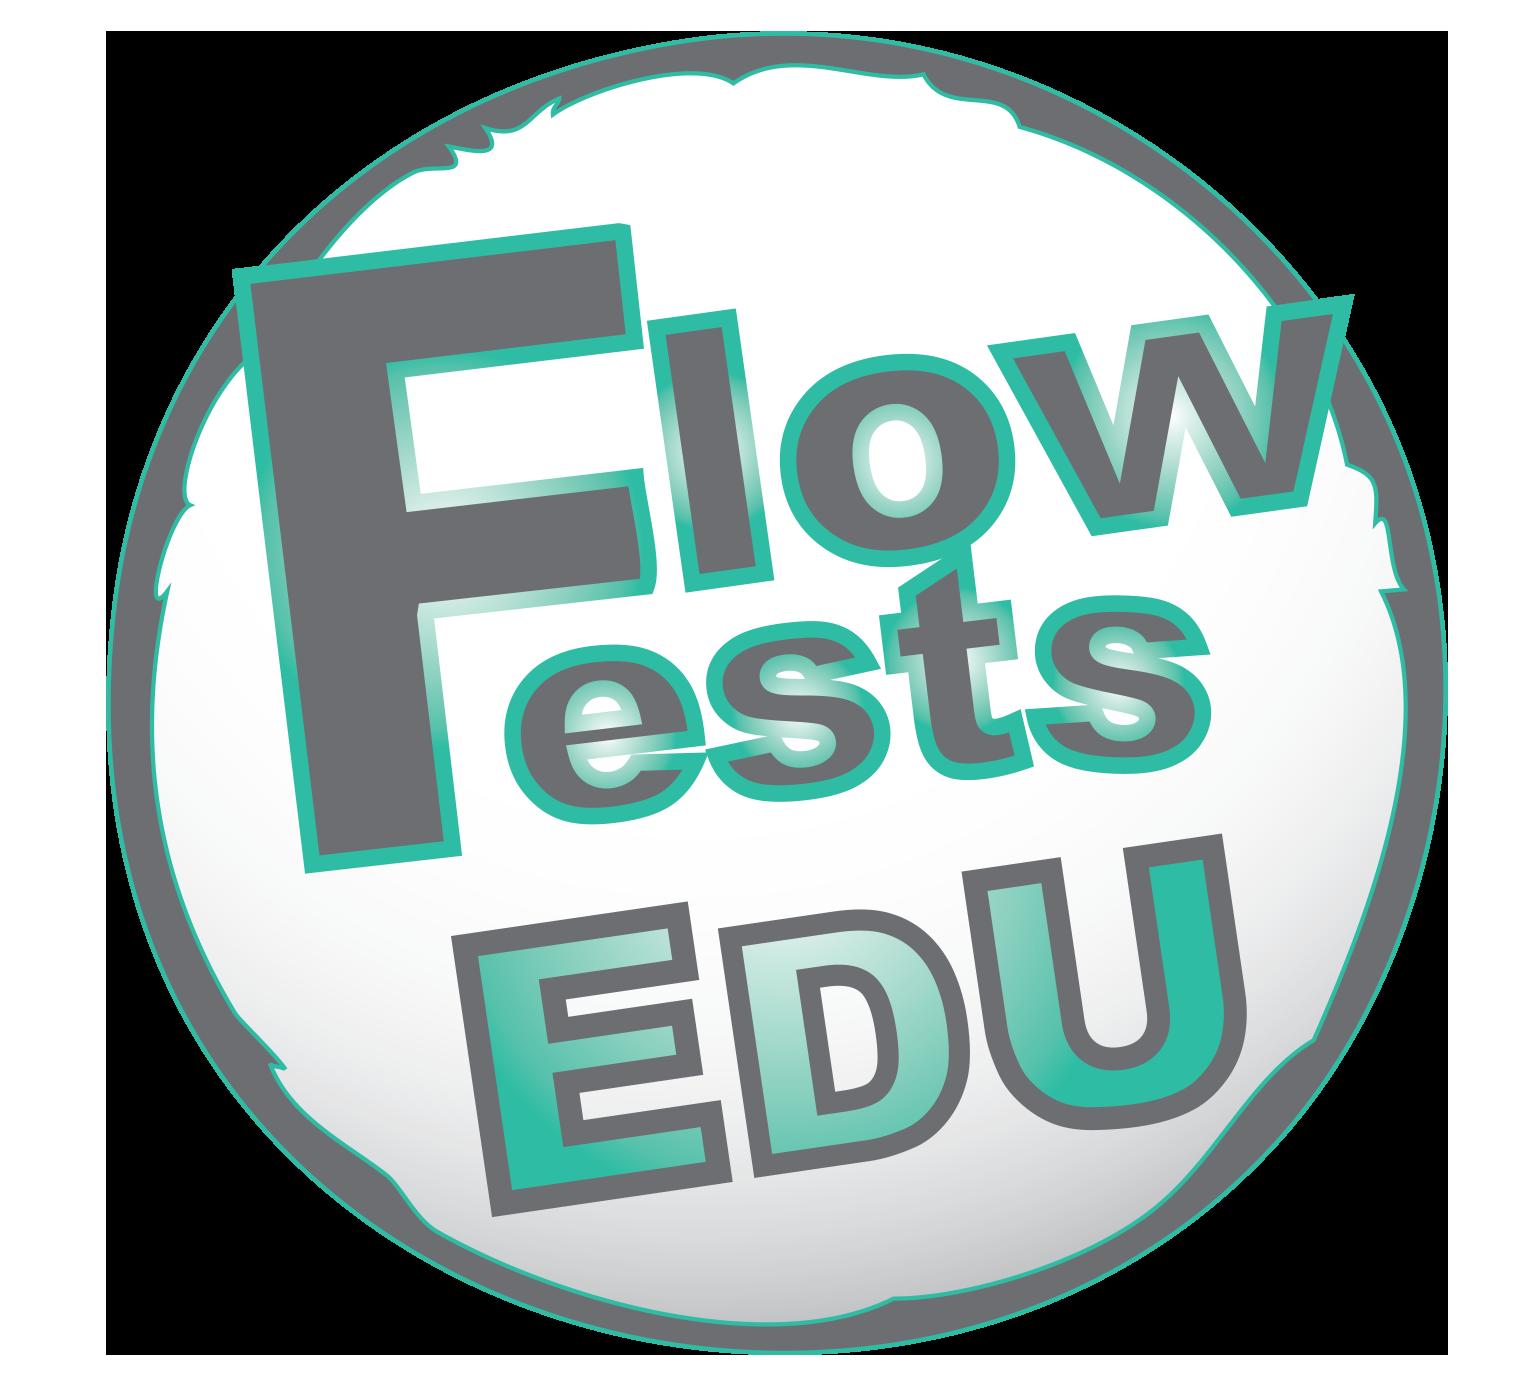 flowedu logo1